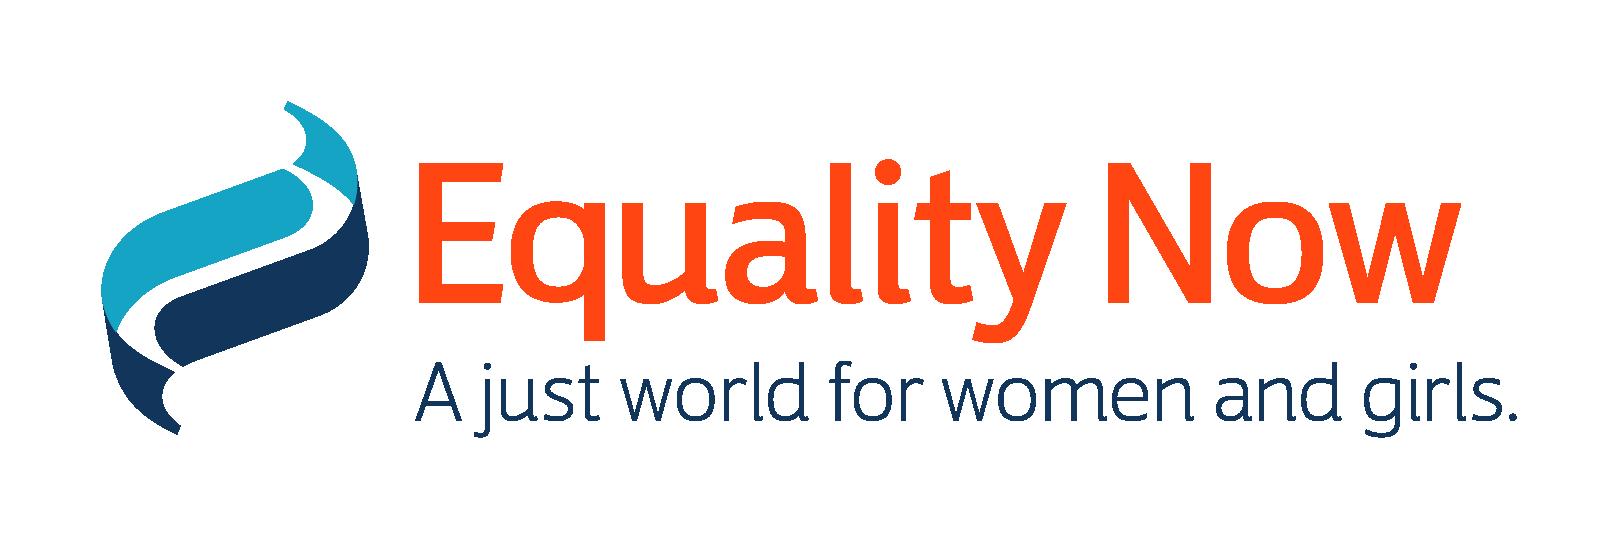 Equality Now Logo